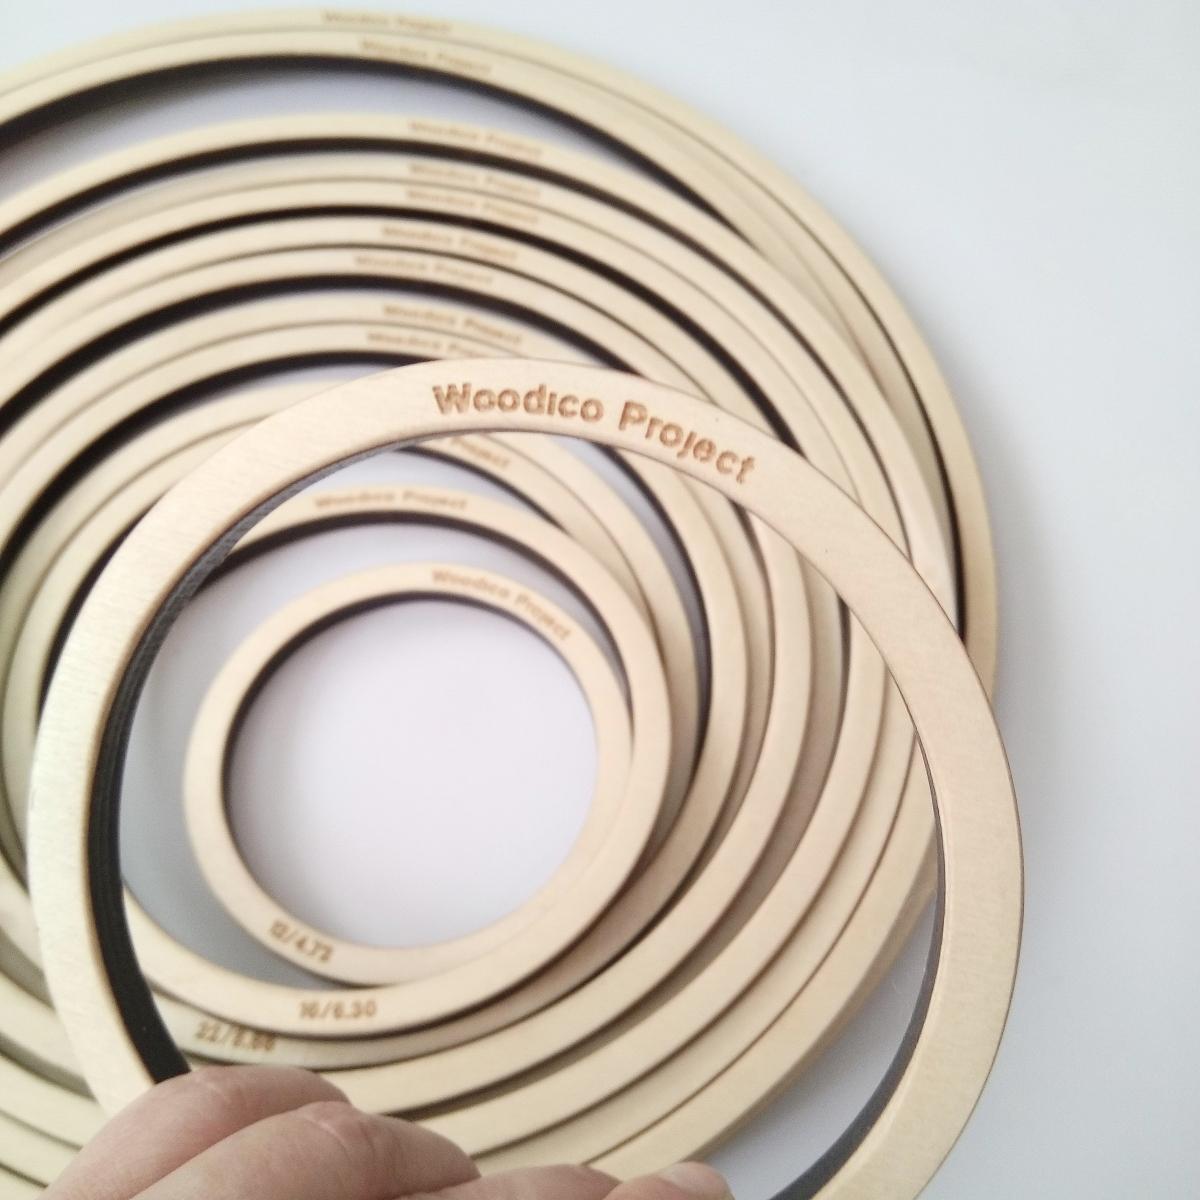 woodico.pro dream catcher base set of 15 rings 12 40 cm 14 1200x1200 - Dream catcher base / Set of 15 rings 12-40 cm